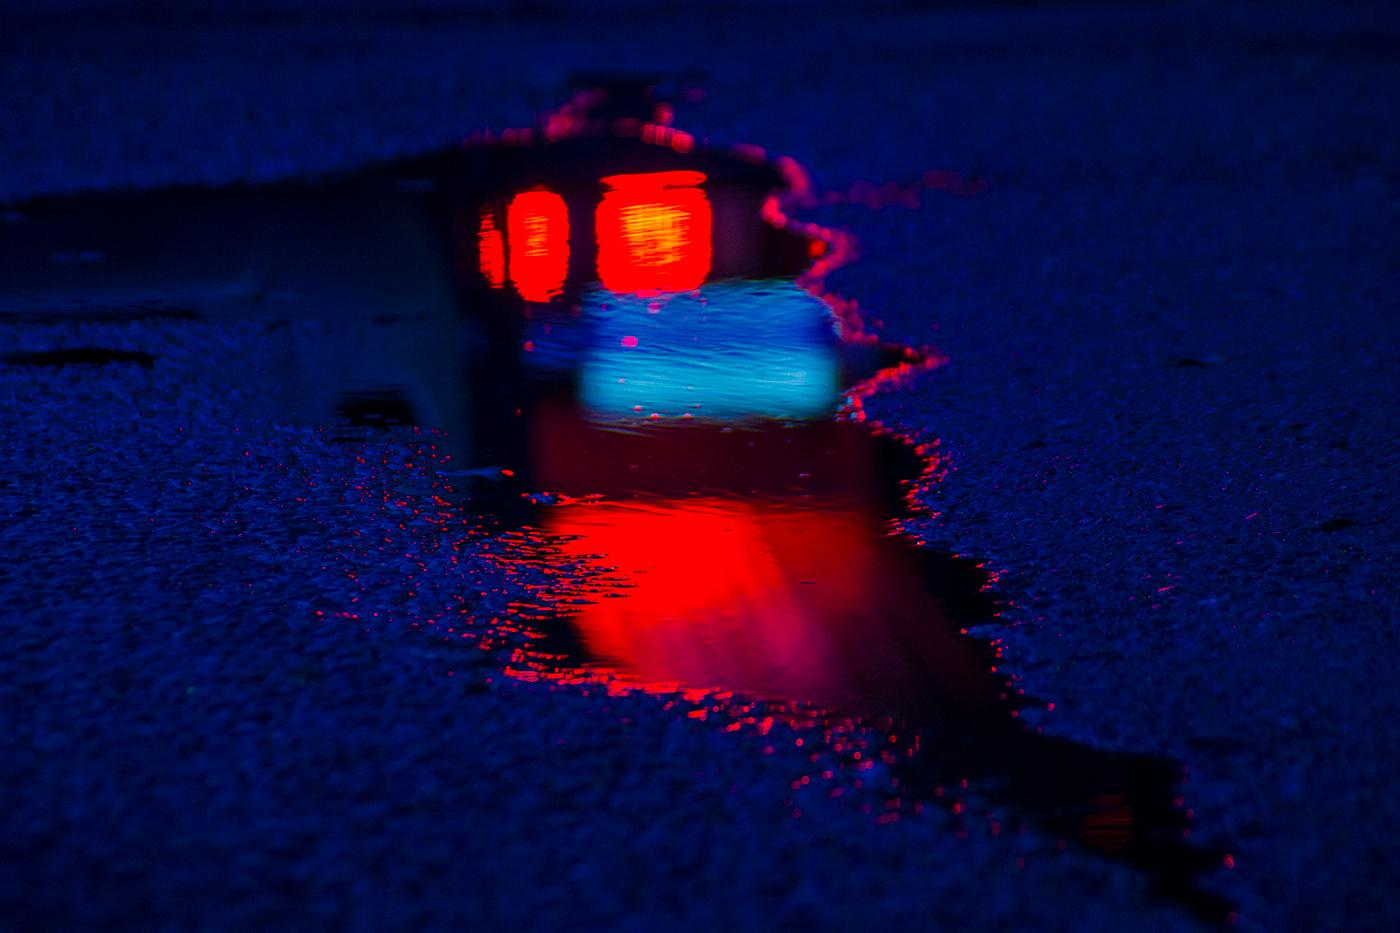 wet-neon-local-preacher-photography-2.jpg